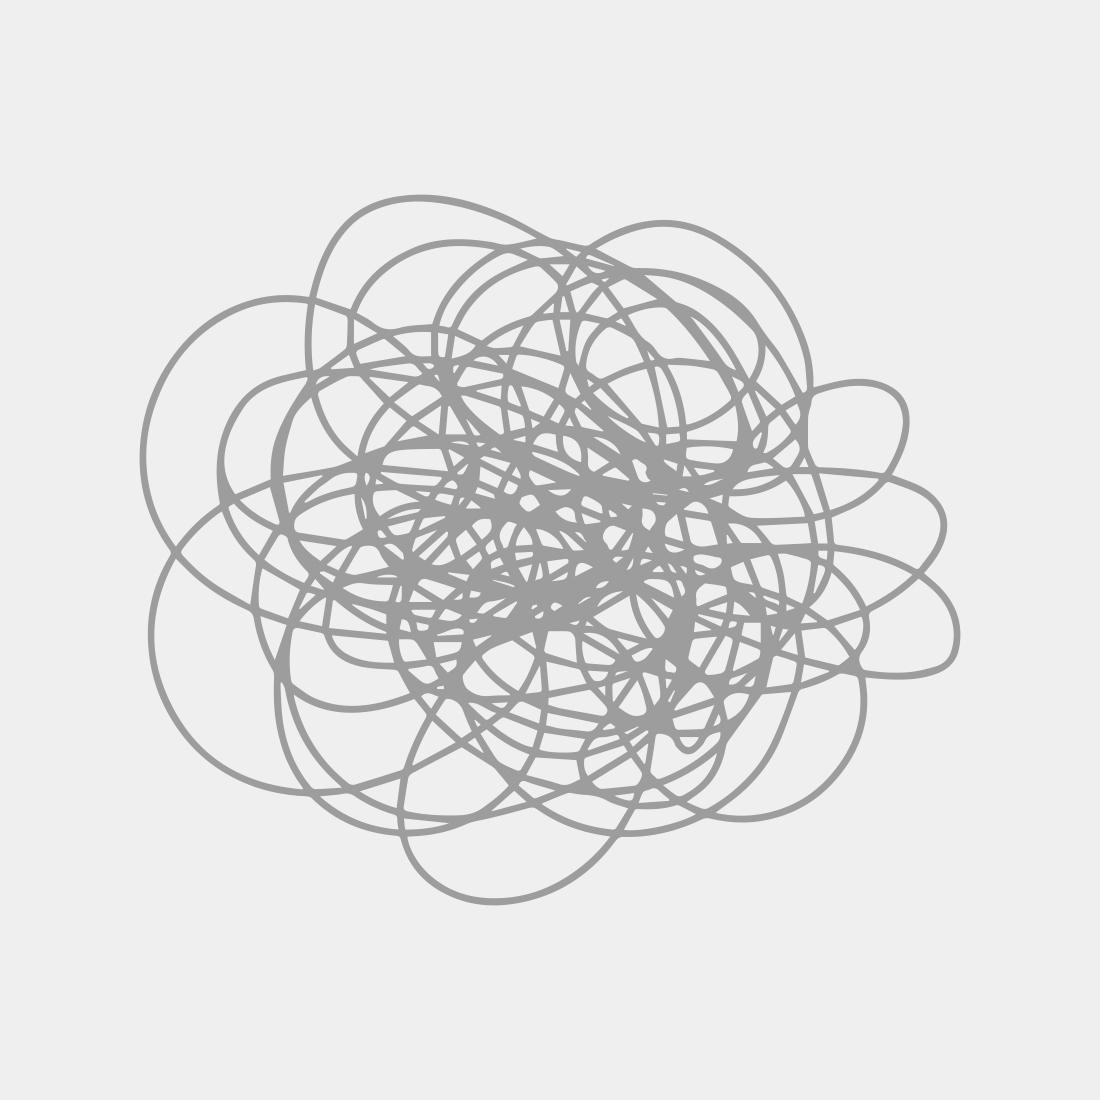 Albert Irvin OBE RA Untitled opus w.17 (framed)